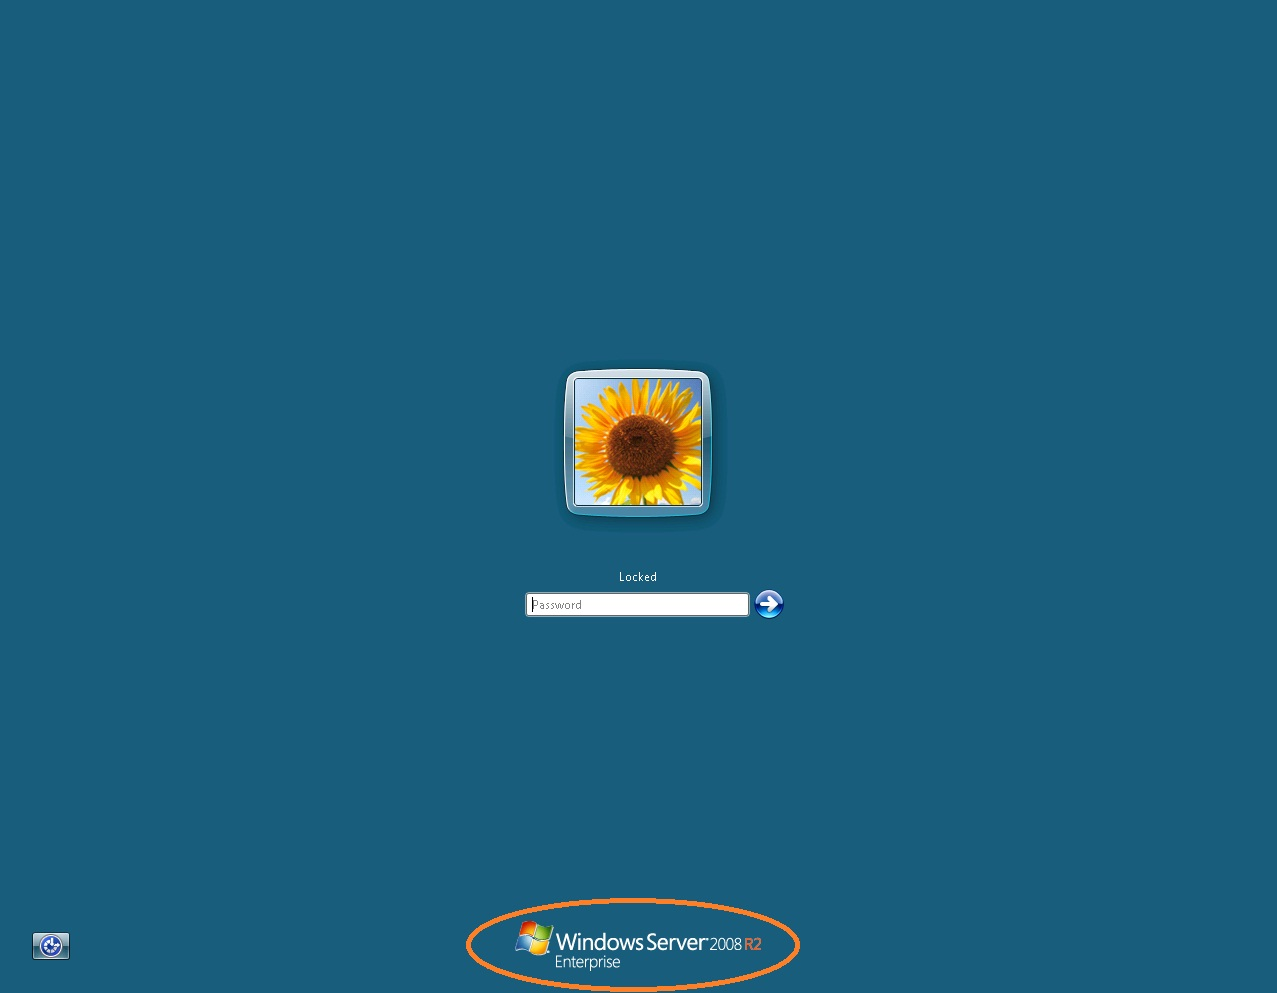 Windows Server 2012 R2 Default Wallpapers For Servers R2 2012 Server 1277x993